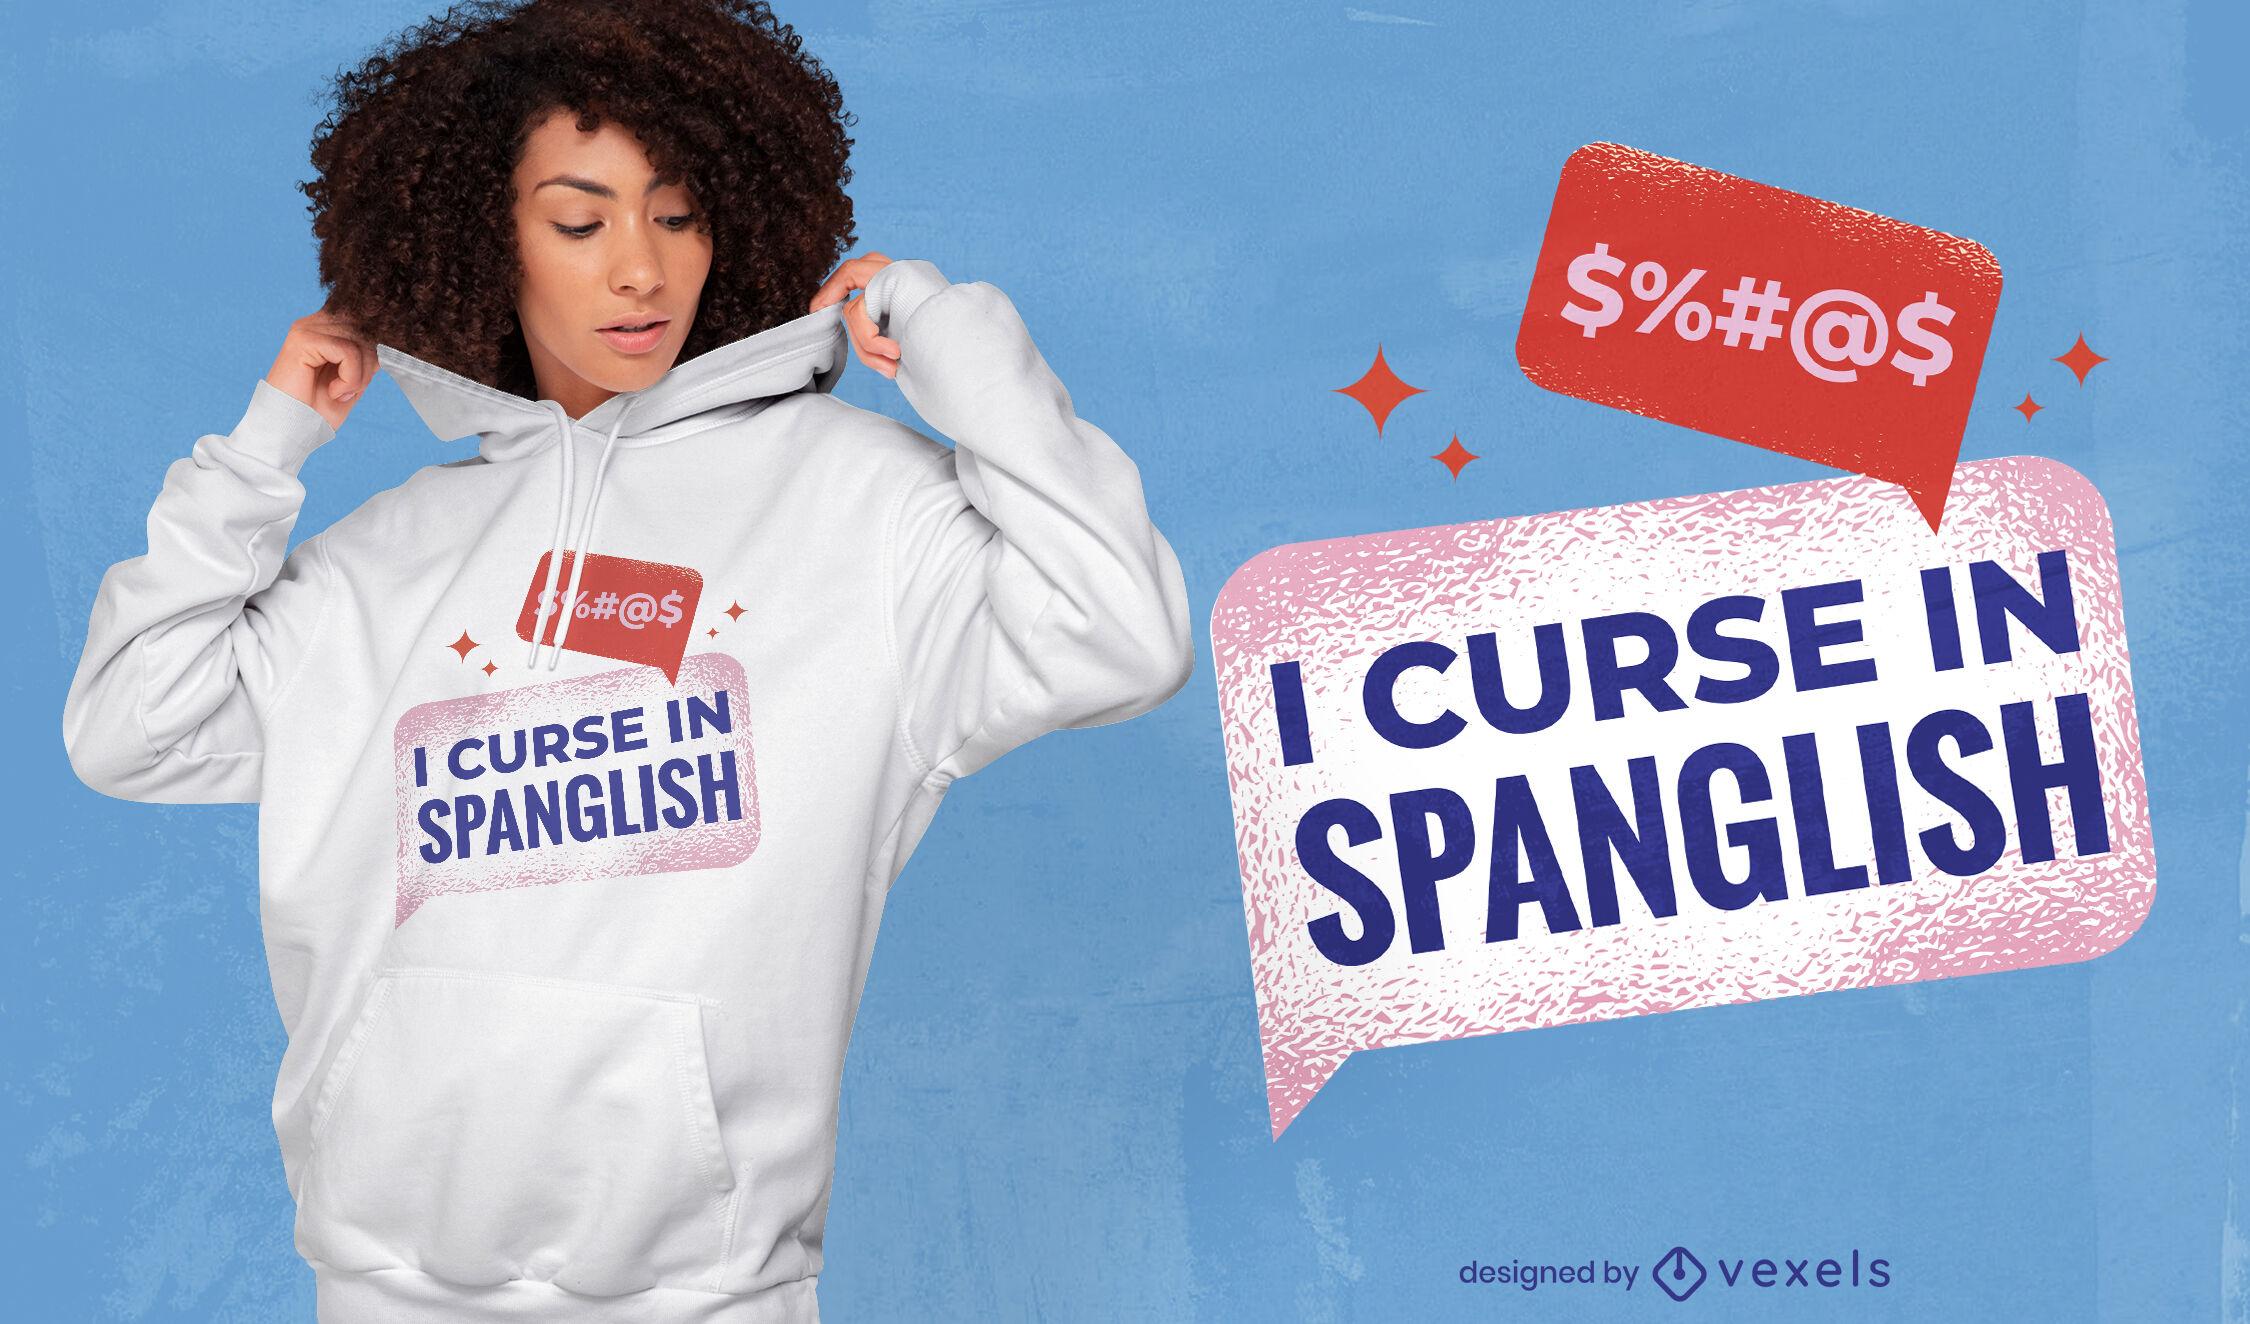 English and spanish funny t-shirt design